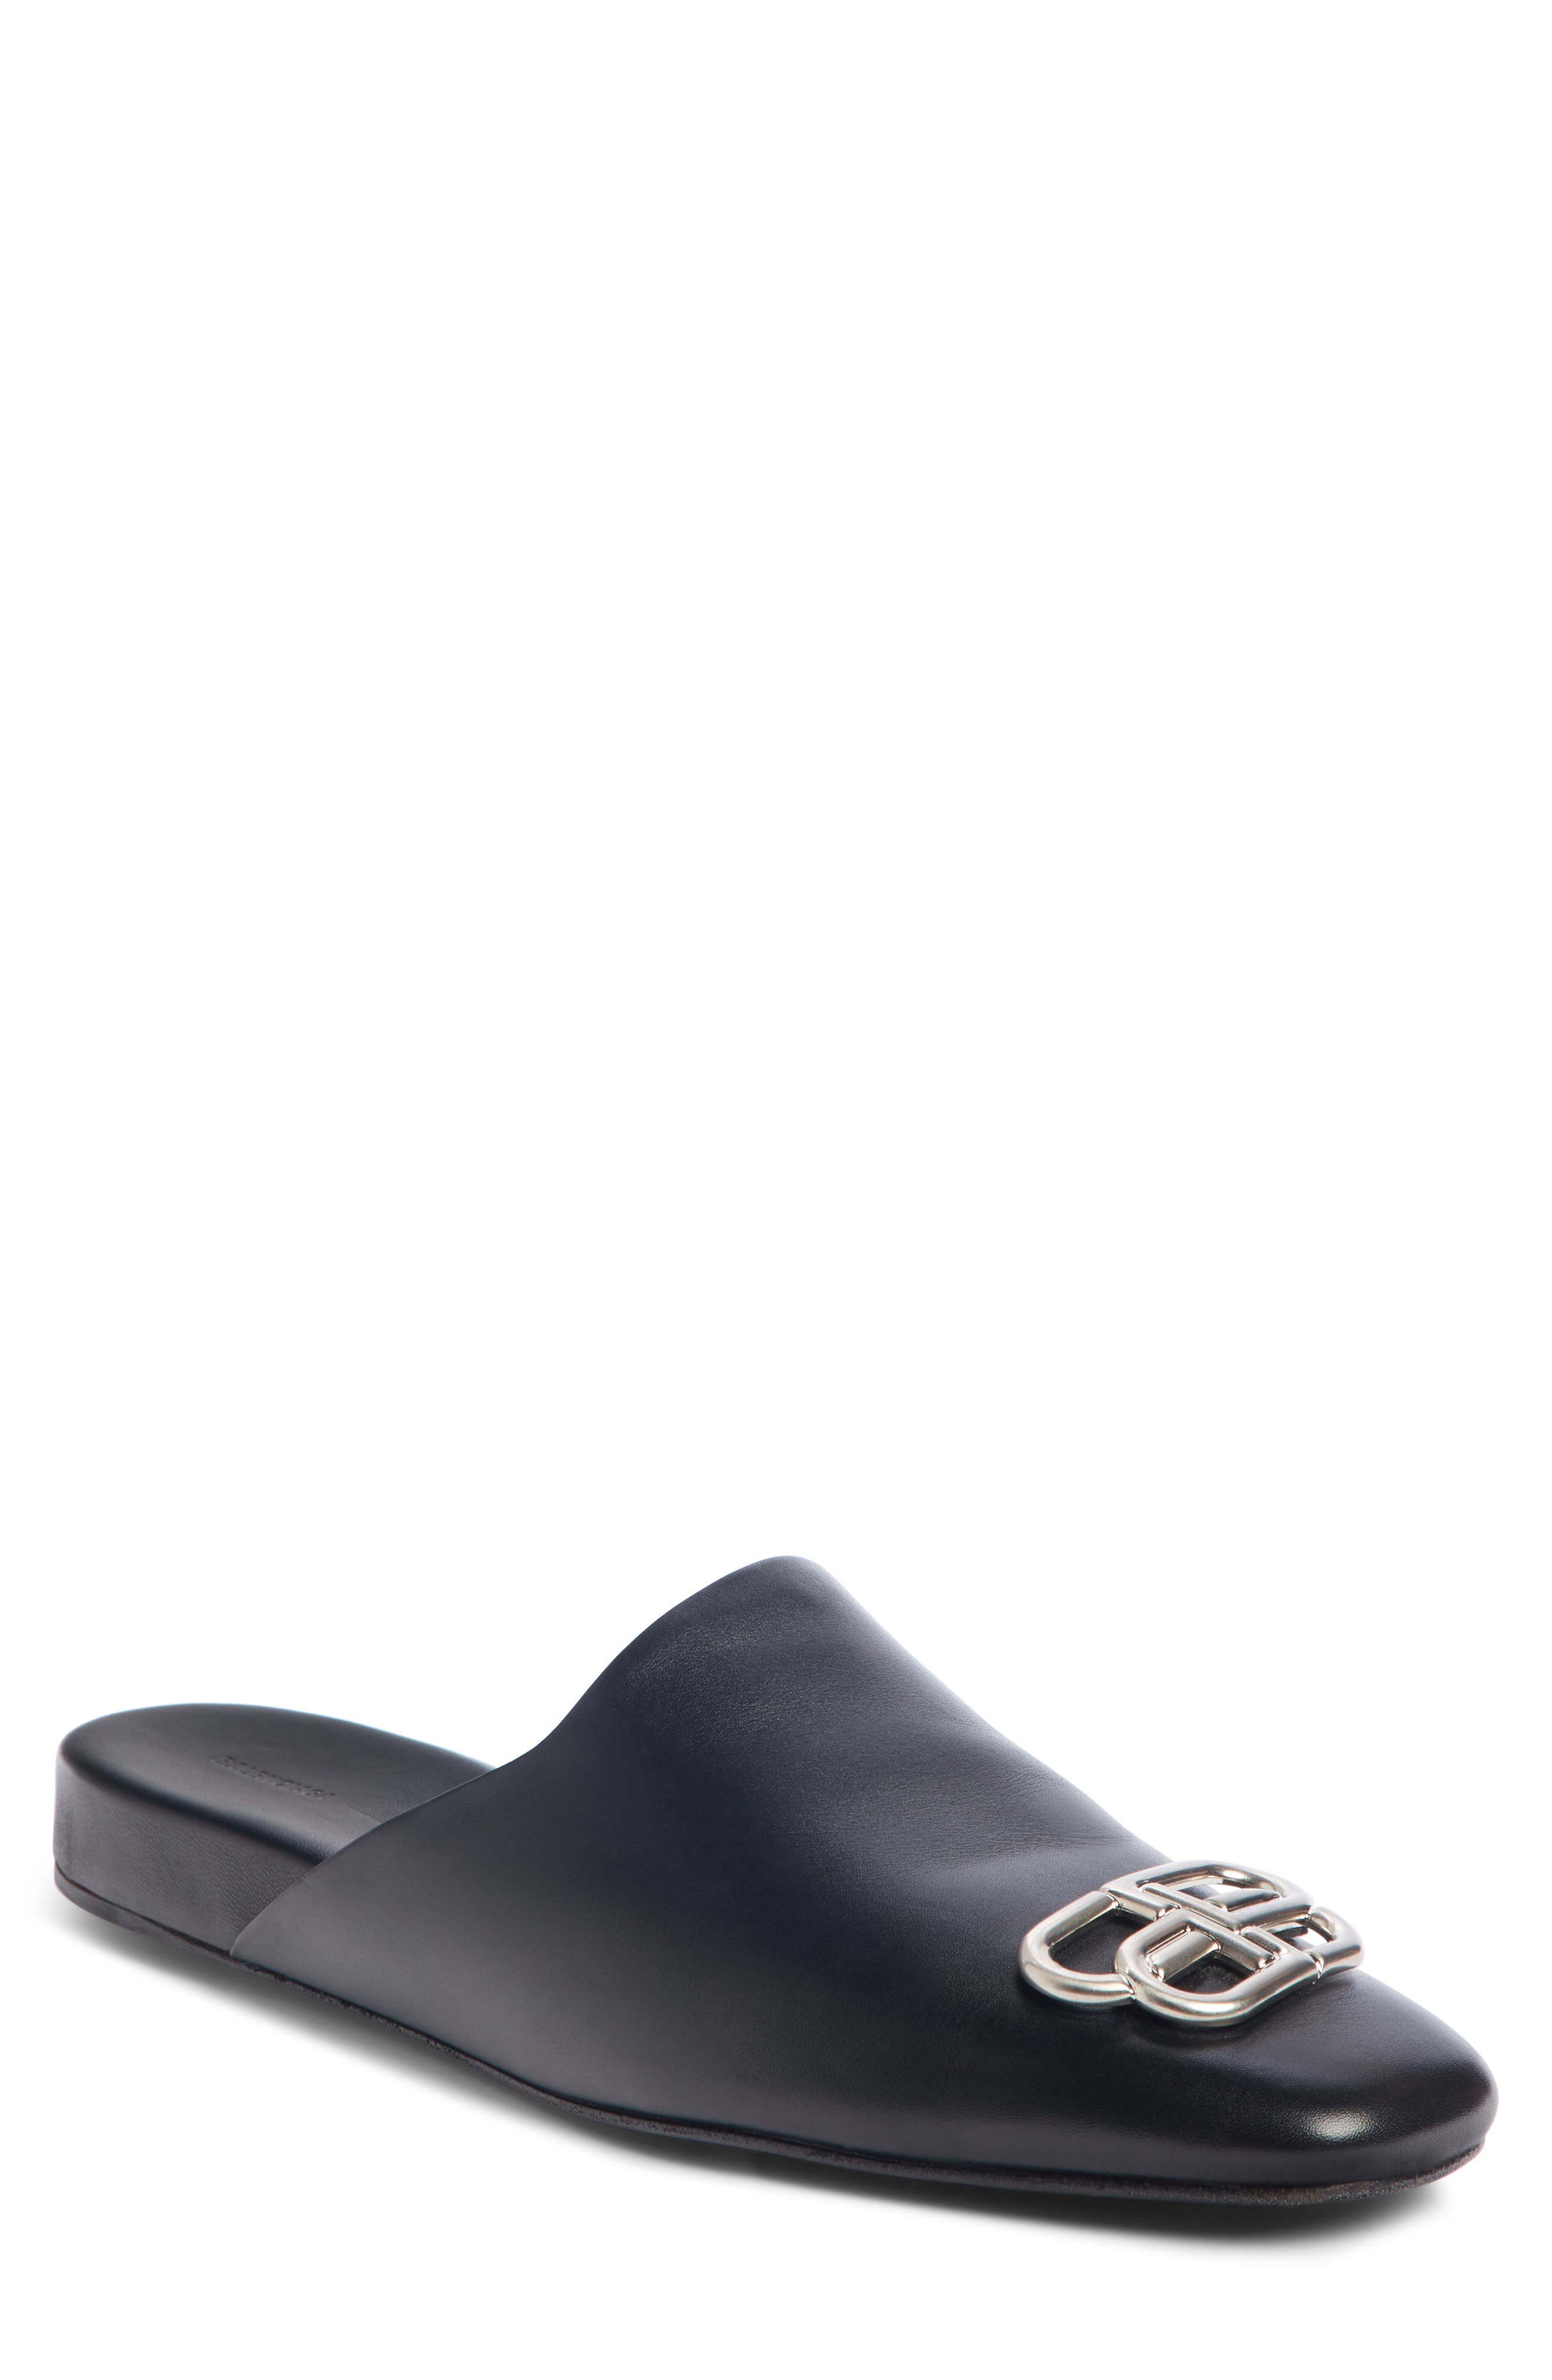 Men's Balenciaga Loafers \u0026 Slip-Ons